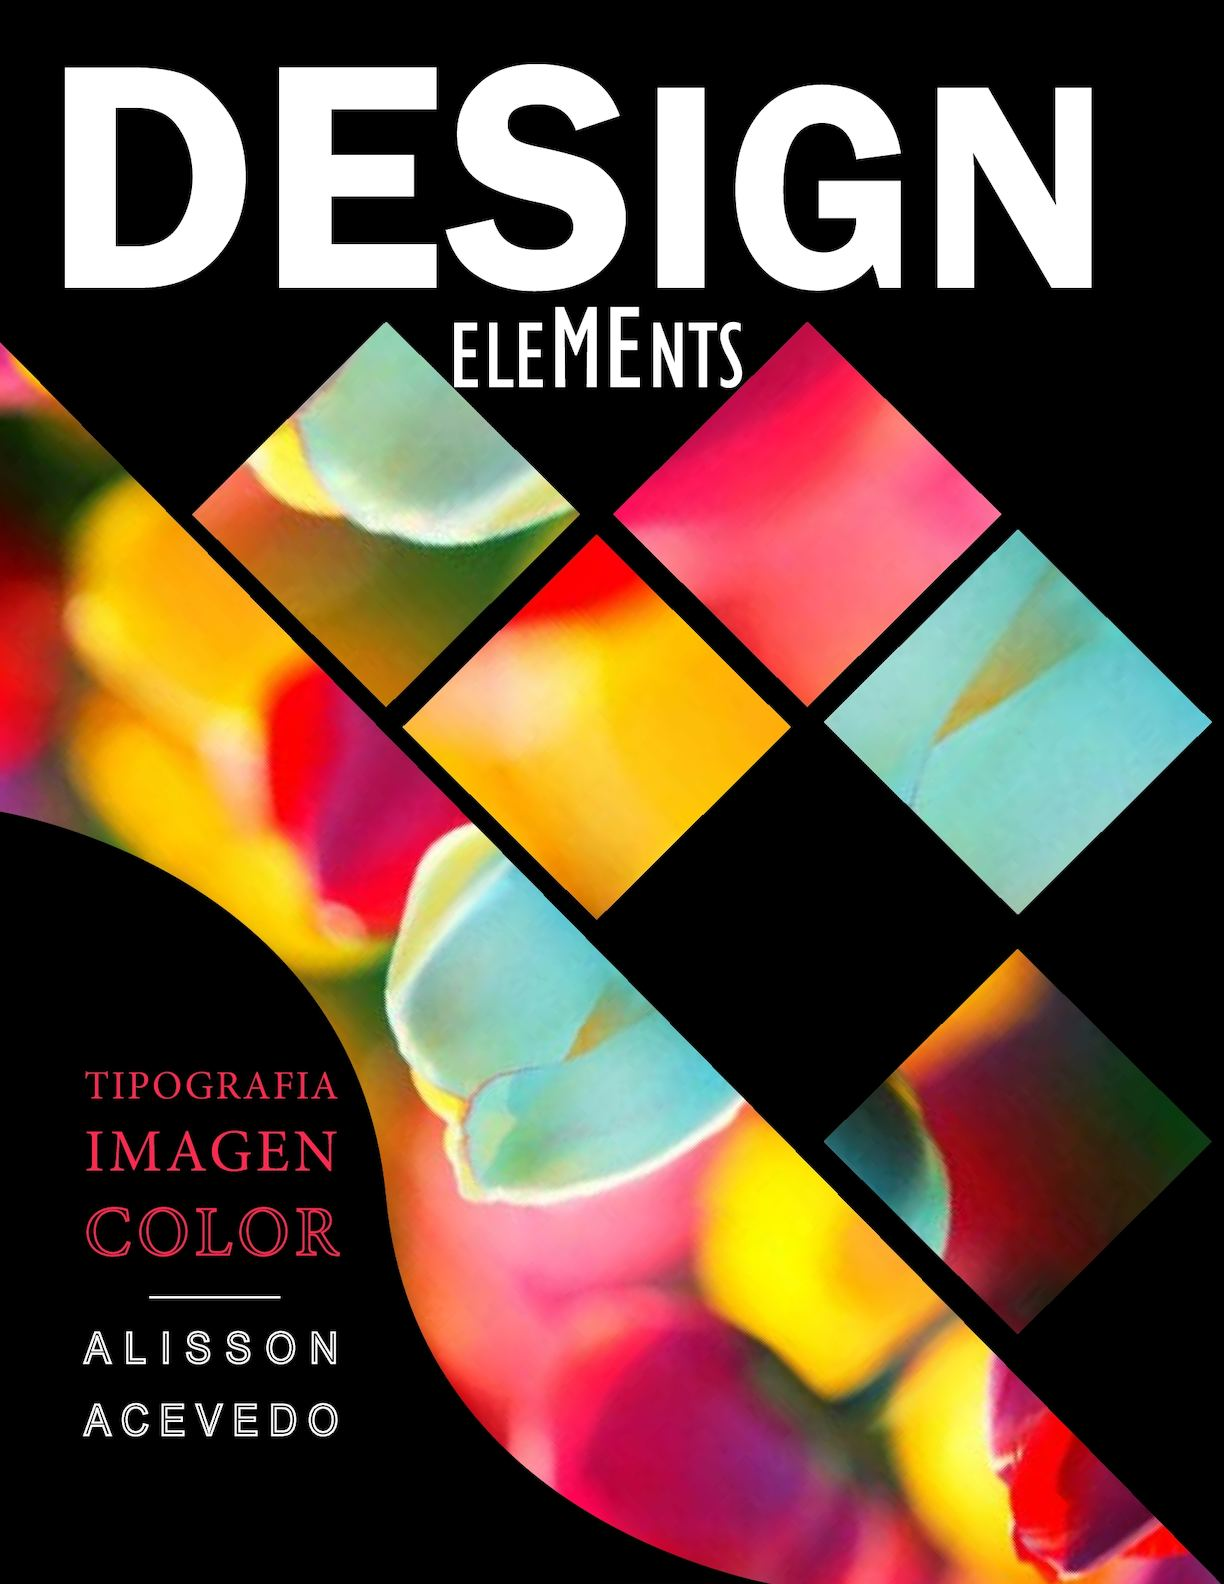 Desing Elements